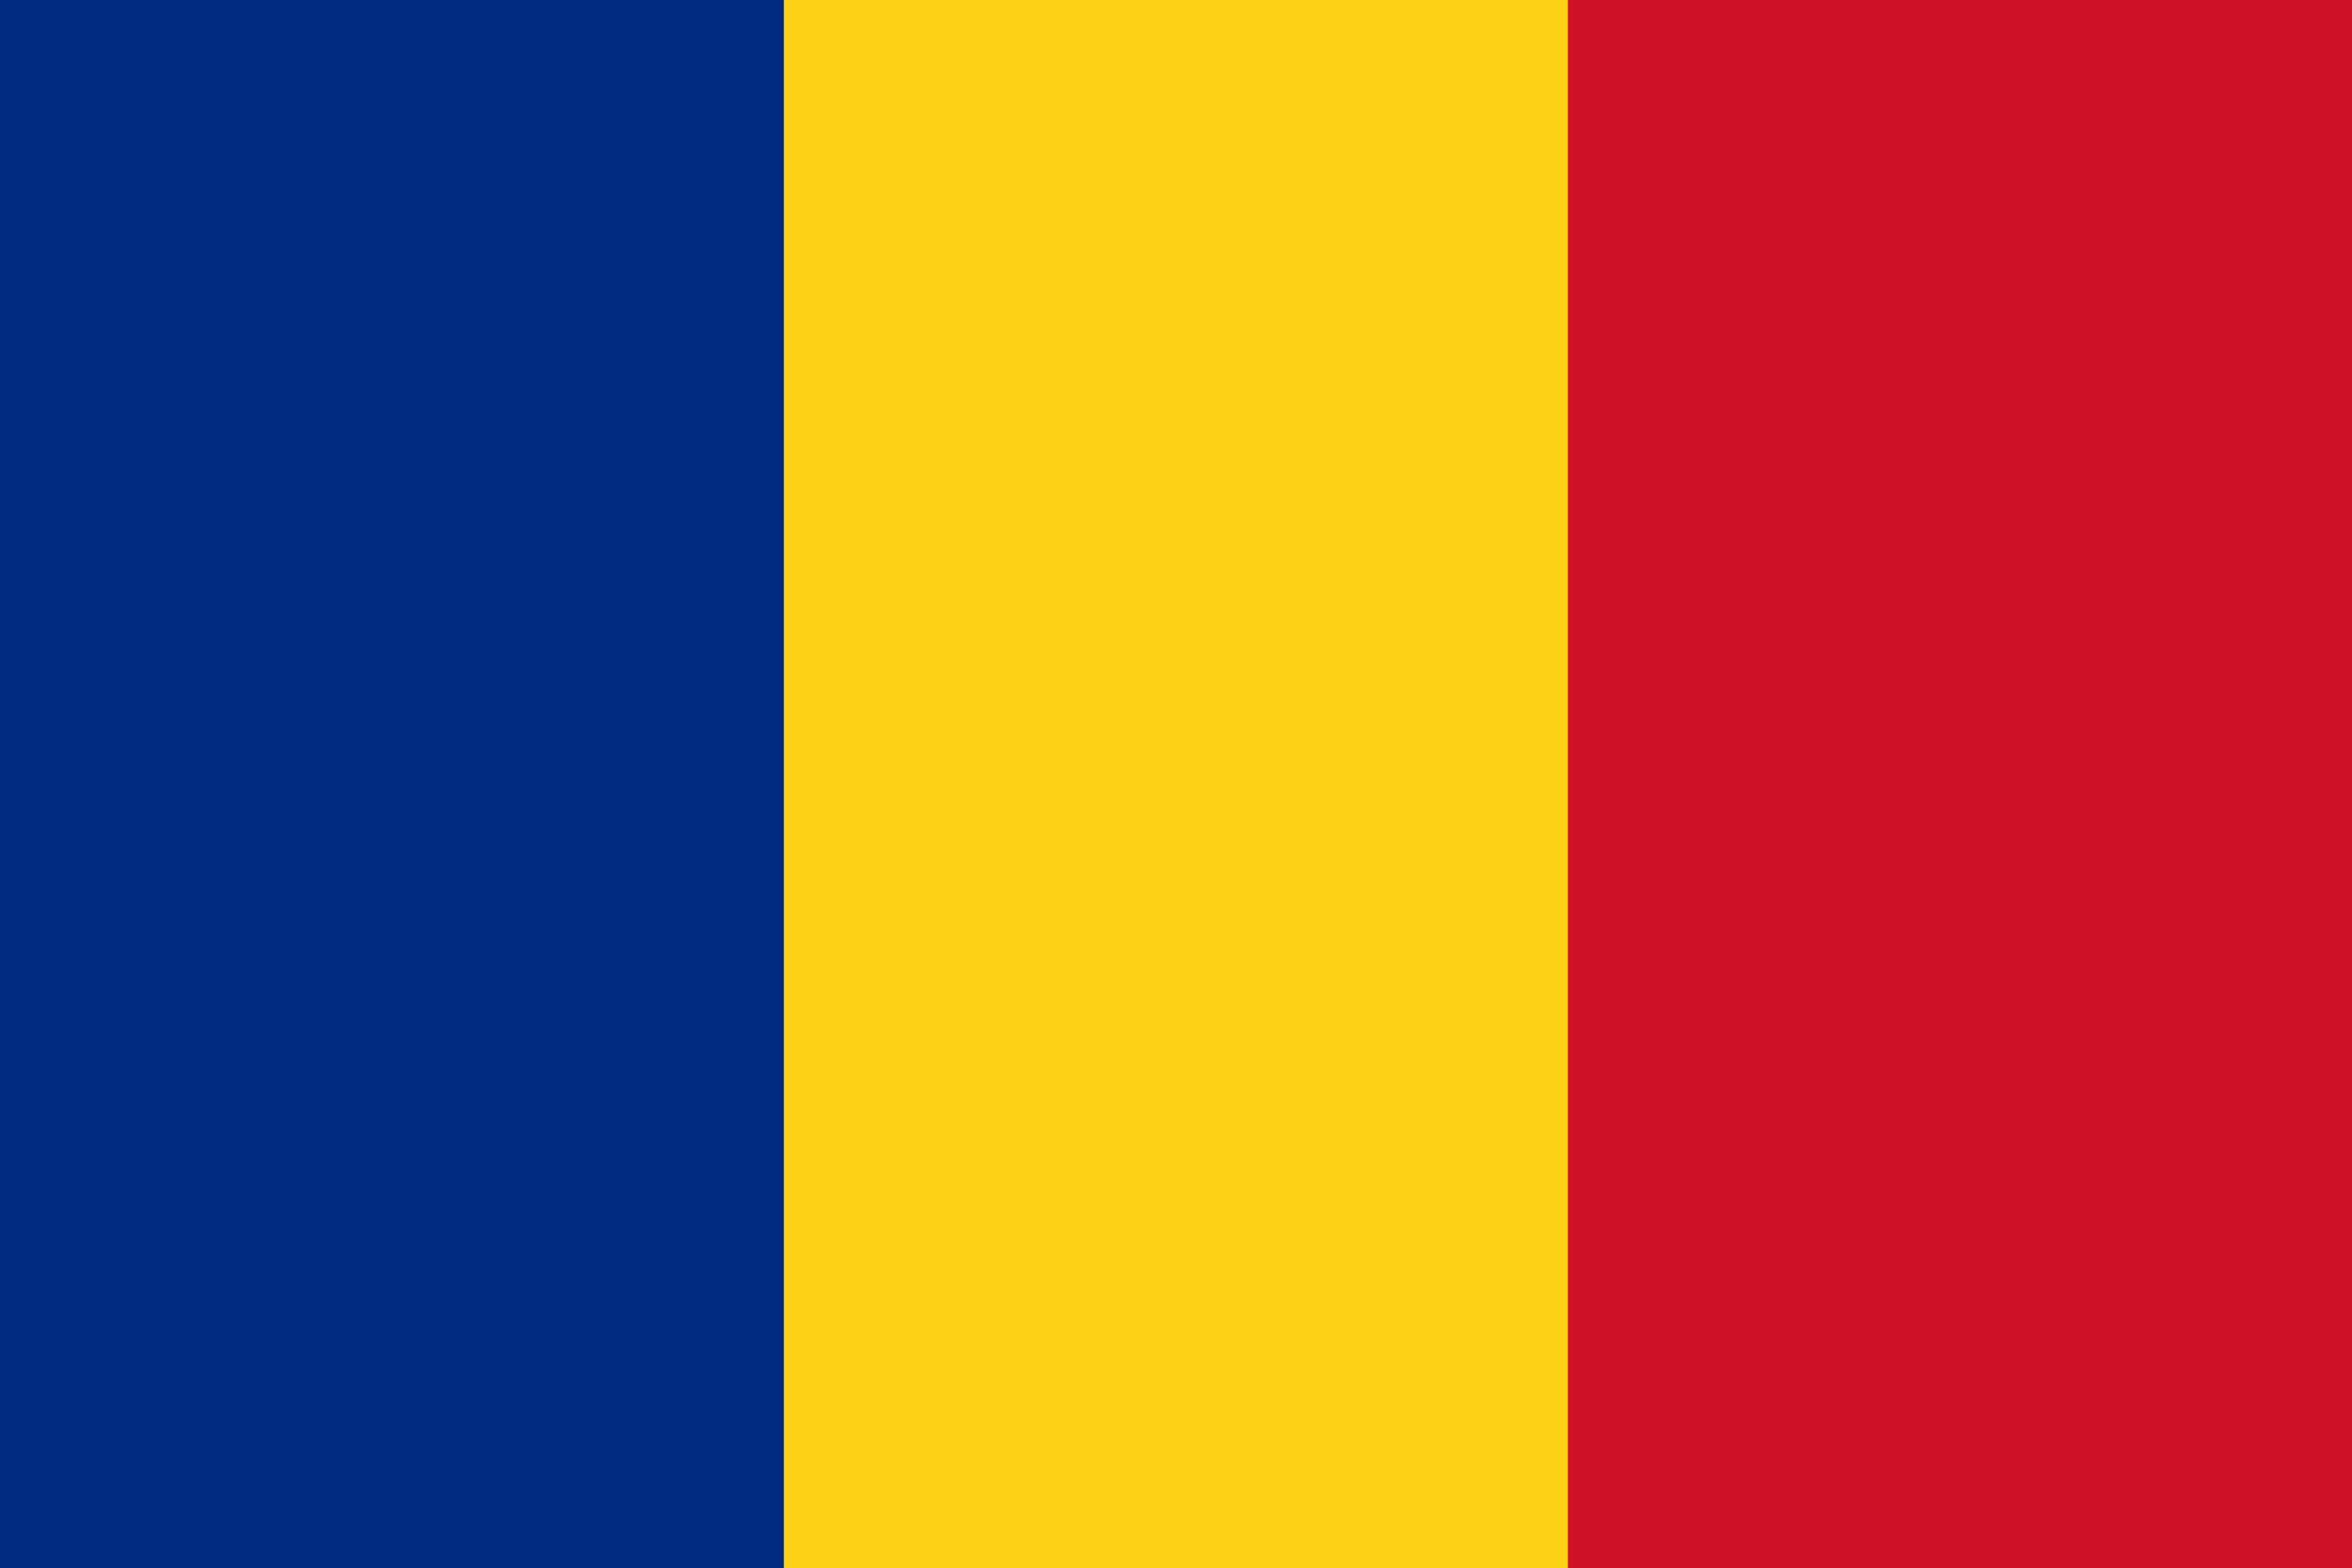 rumania, paese, emblema, logo, simbolo - Sfondi HD - Professor-falken.com